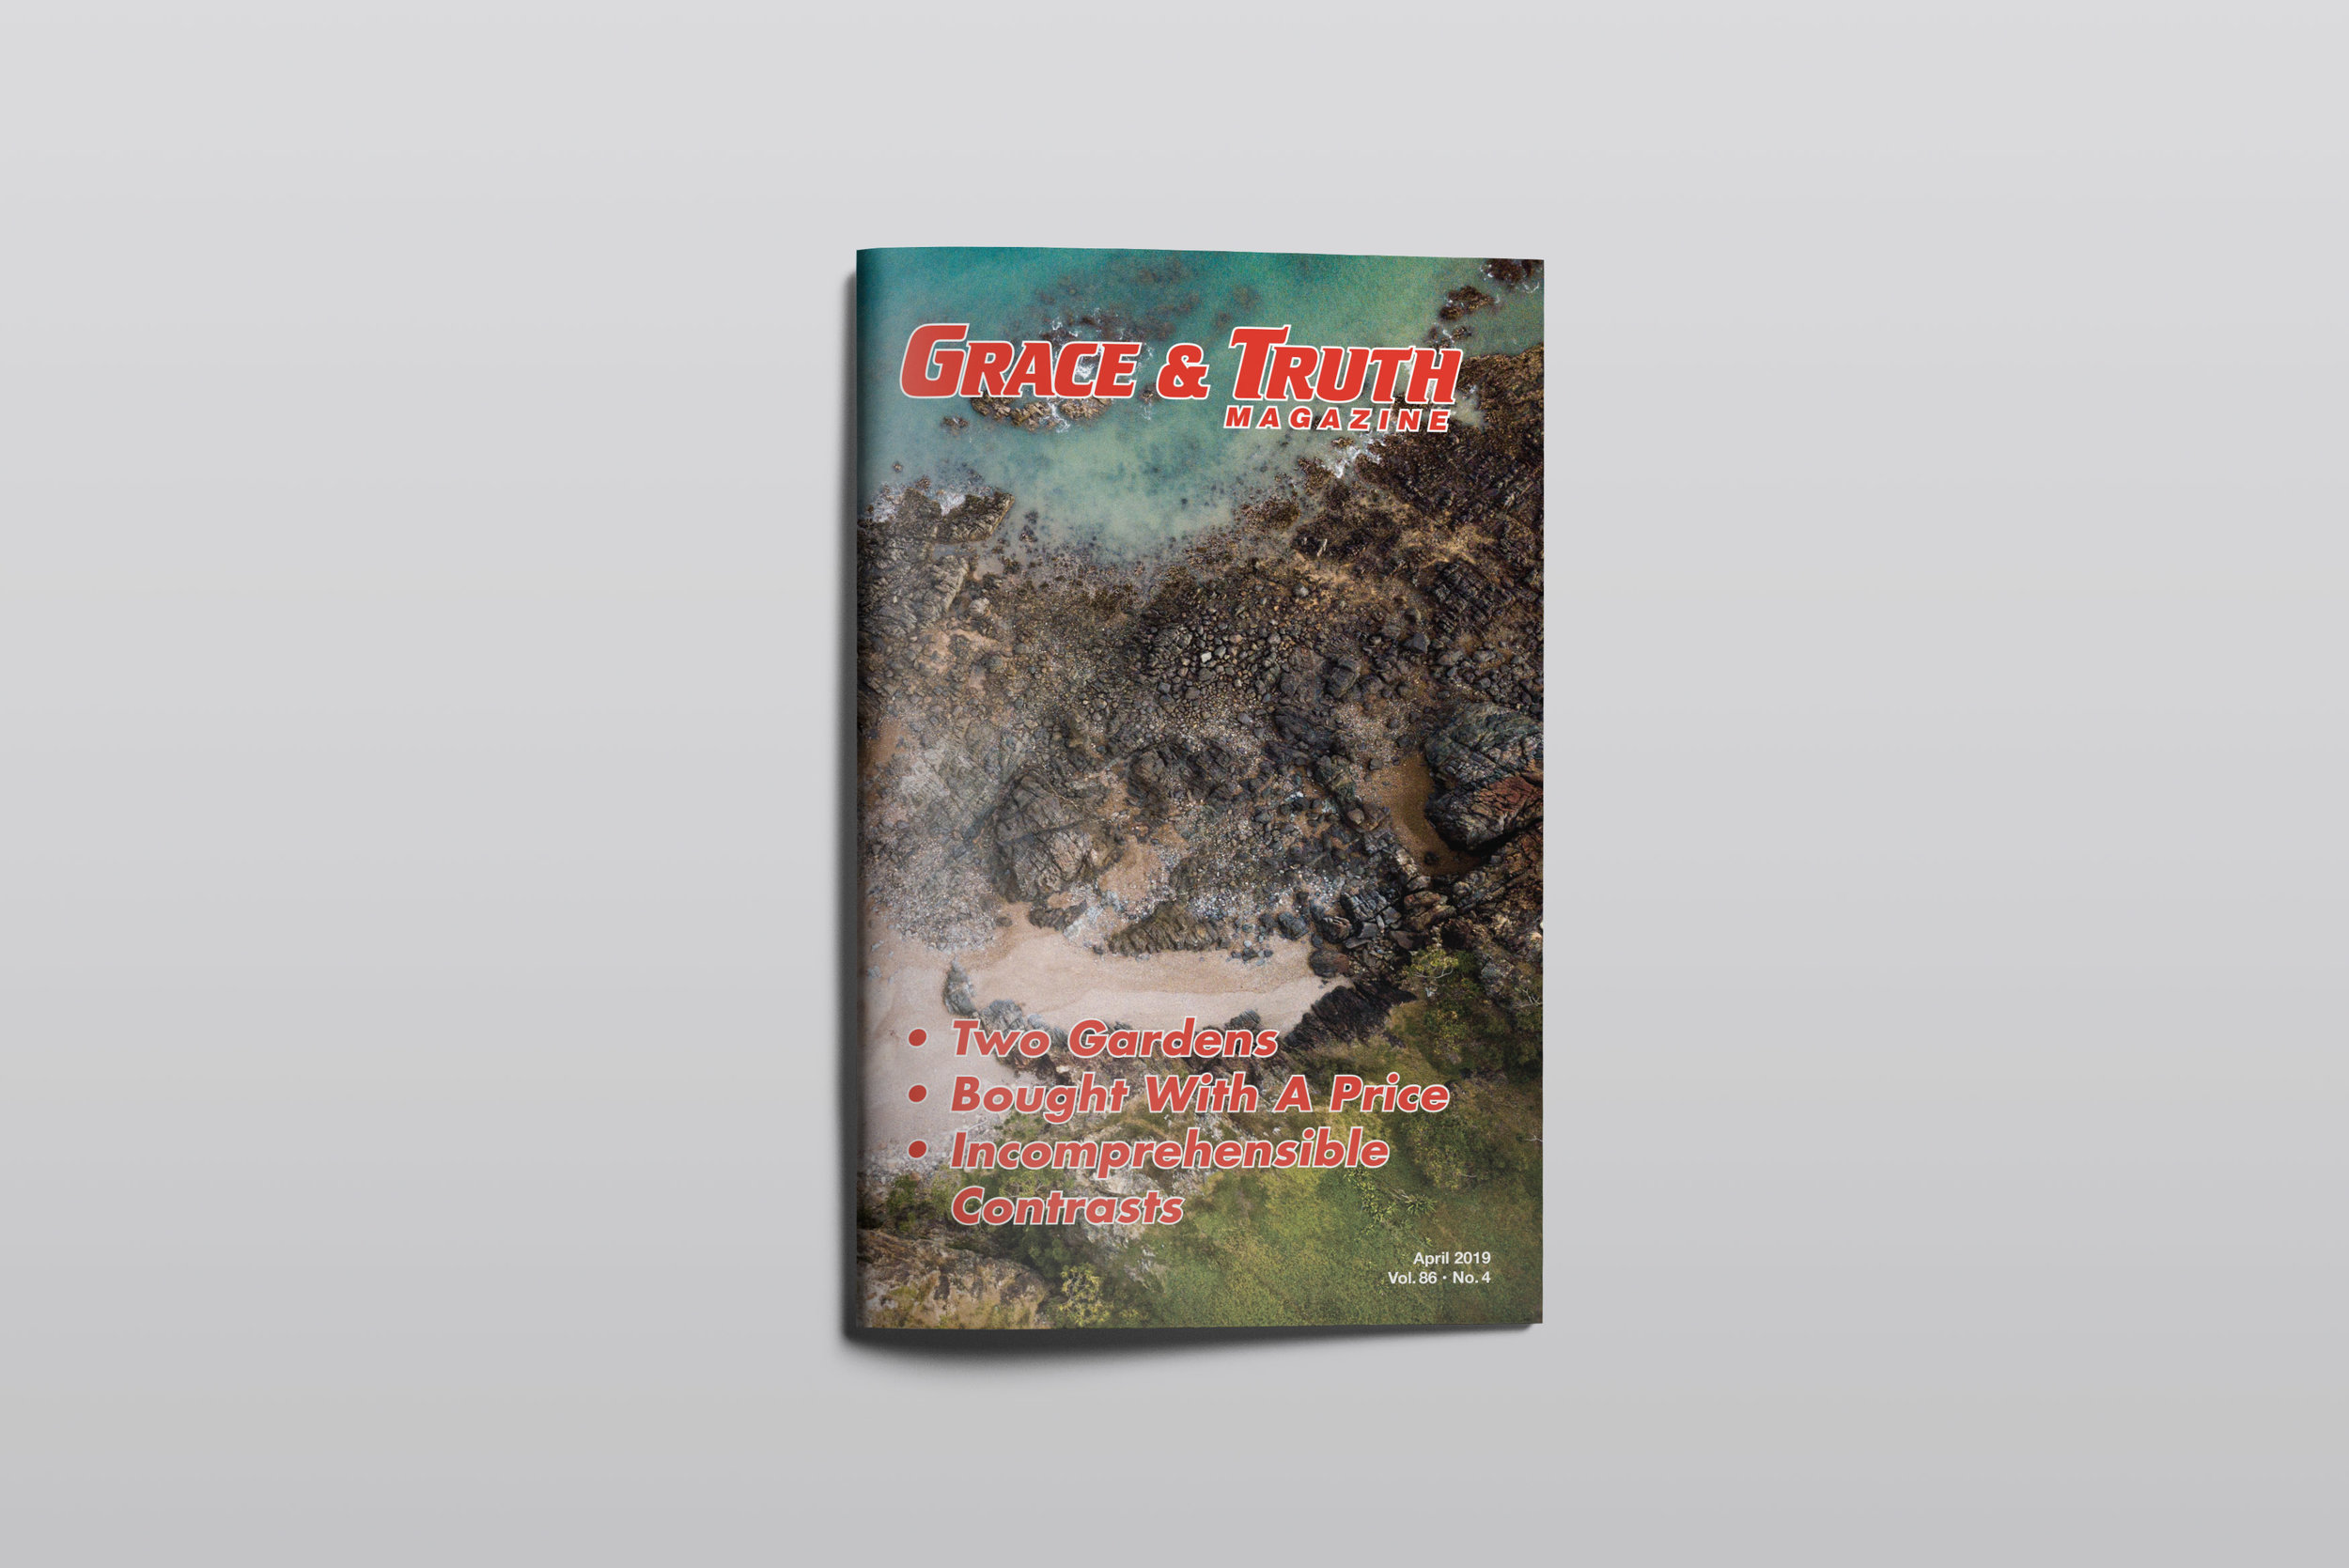 GRACE & TRUTH MAGAZINE